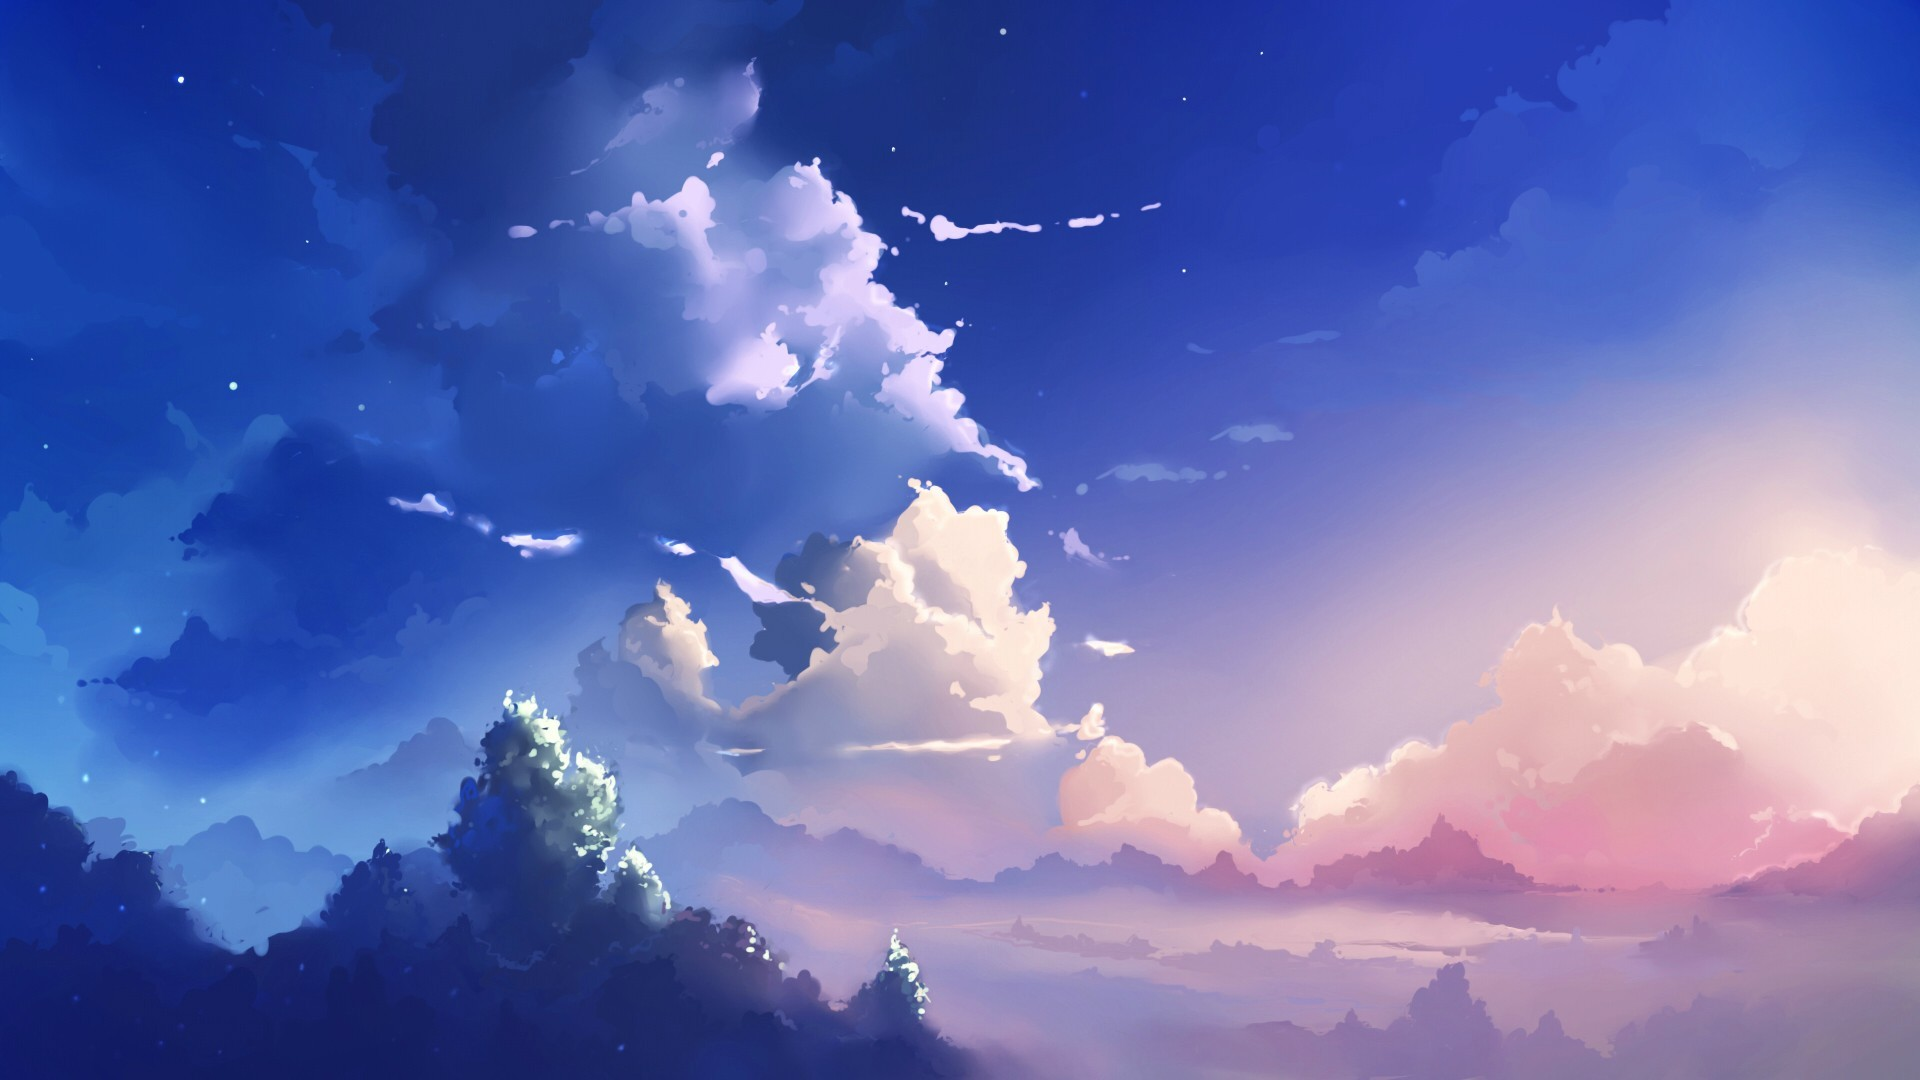 Anime Background (83+ images)